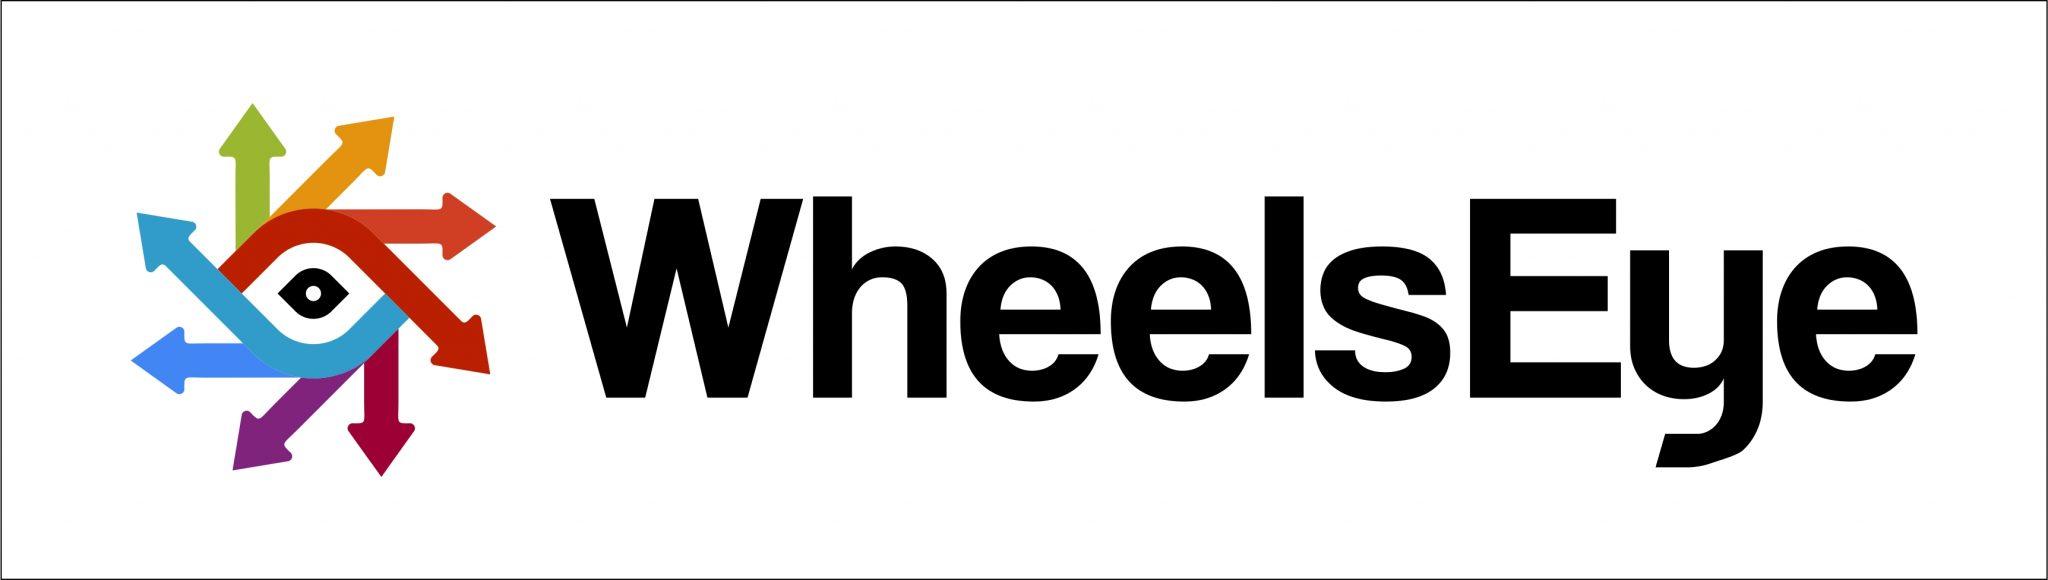 https://ekachdhyeya.com/wp-content/uploads/2021/02/WheelsEye-scaled.jpg